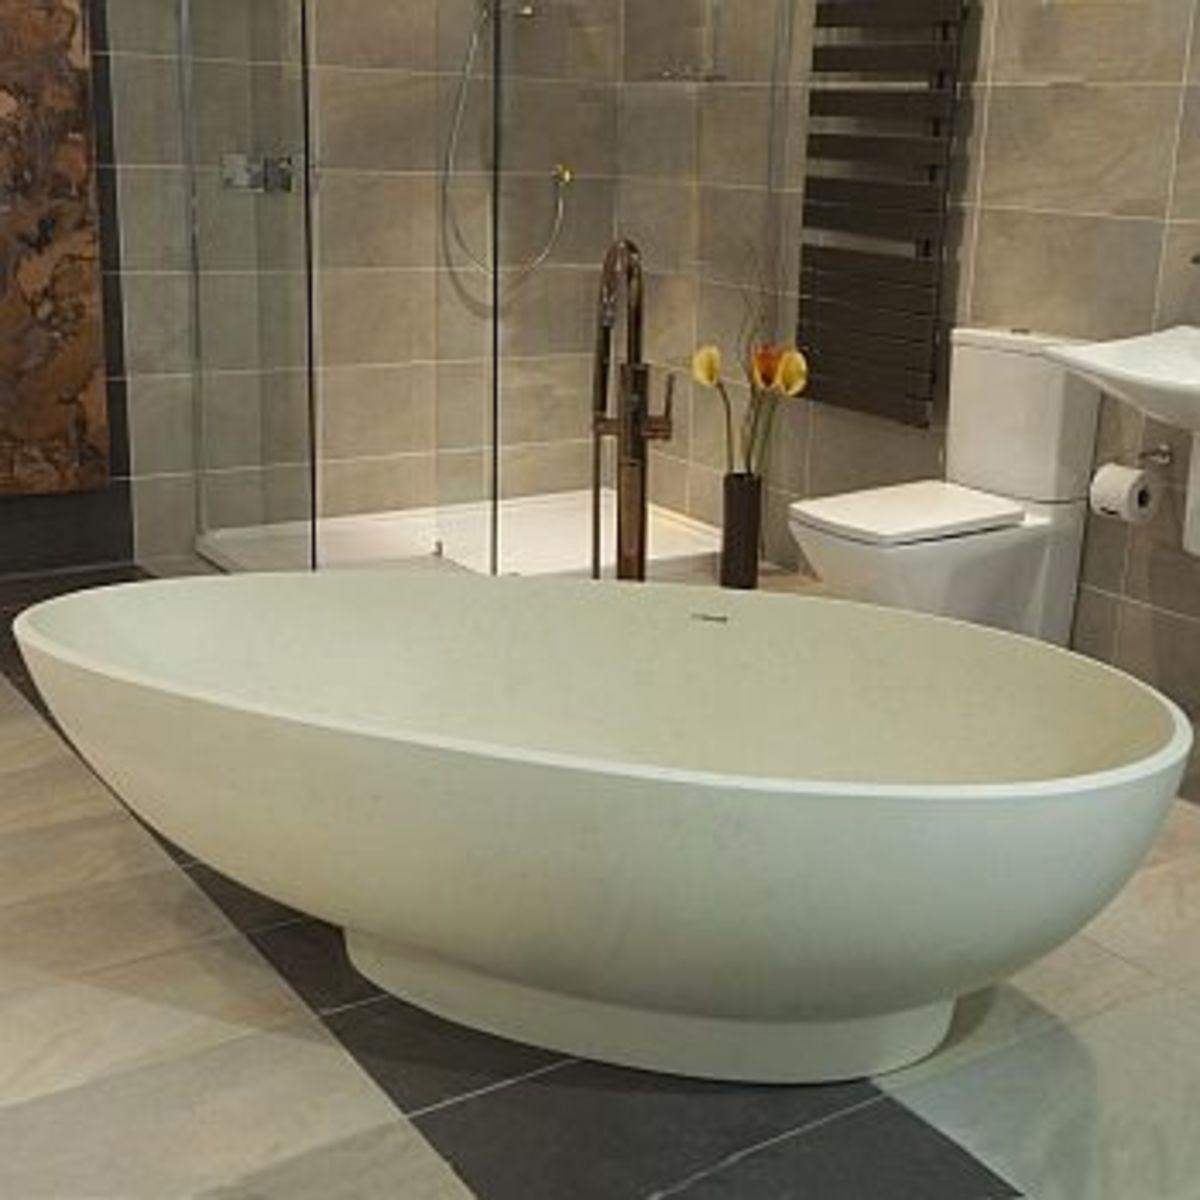 Olympian Nero Stone Bath by Boundary Bathrooms (unfortunately no longer available)